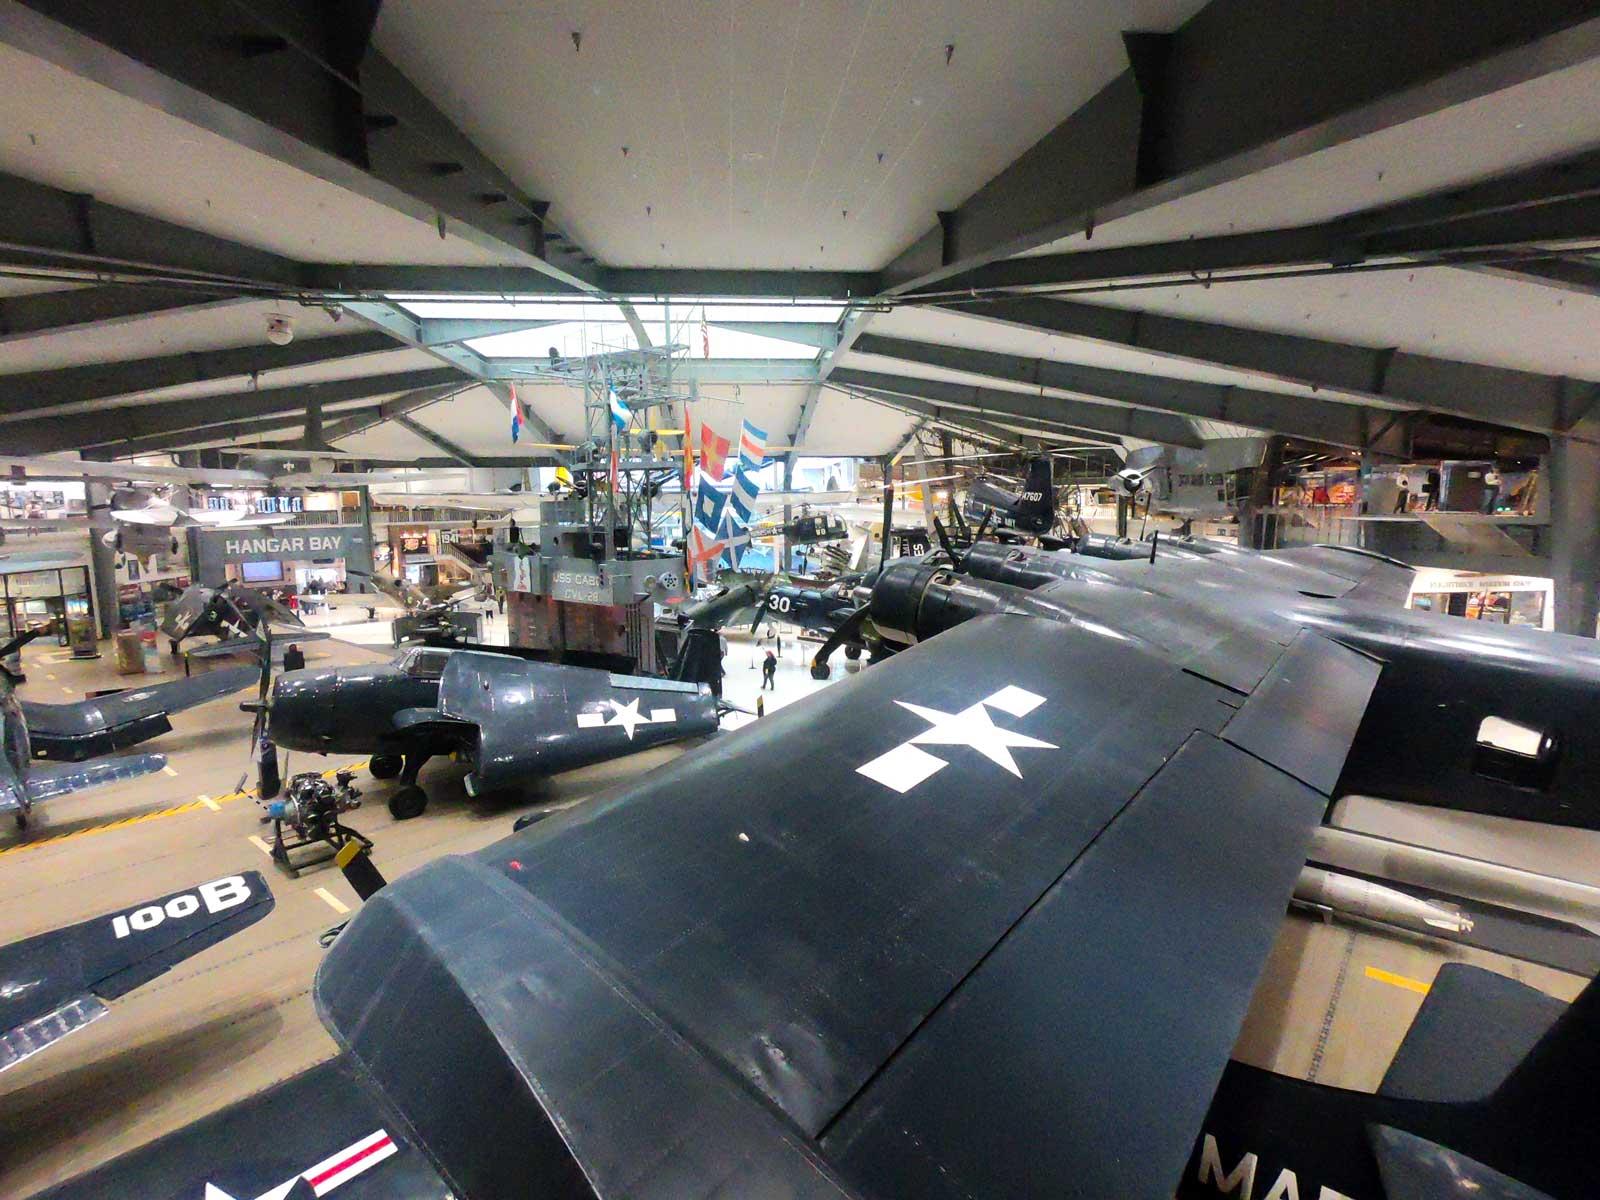 Hangar full of Navy aircraft on display at National Naval Aviation Museum, Pensacola, Florida